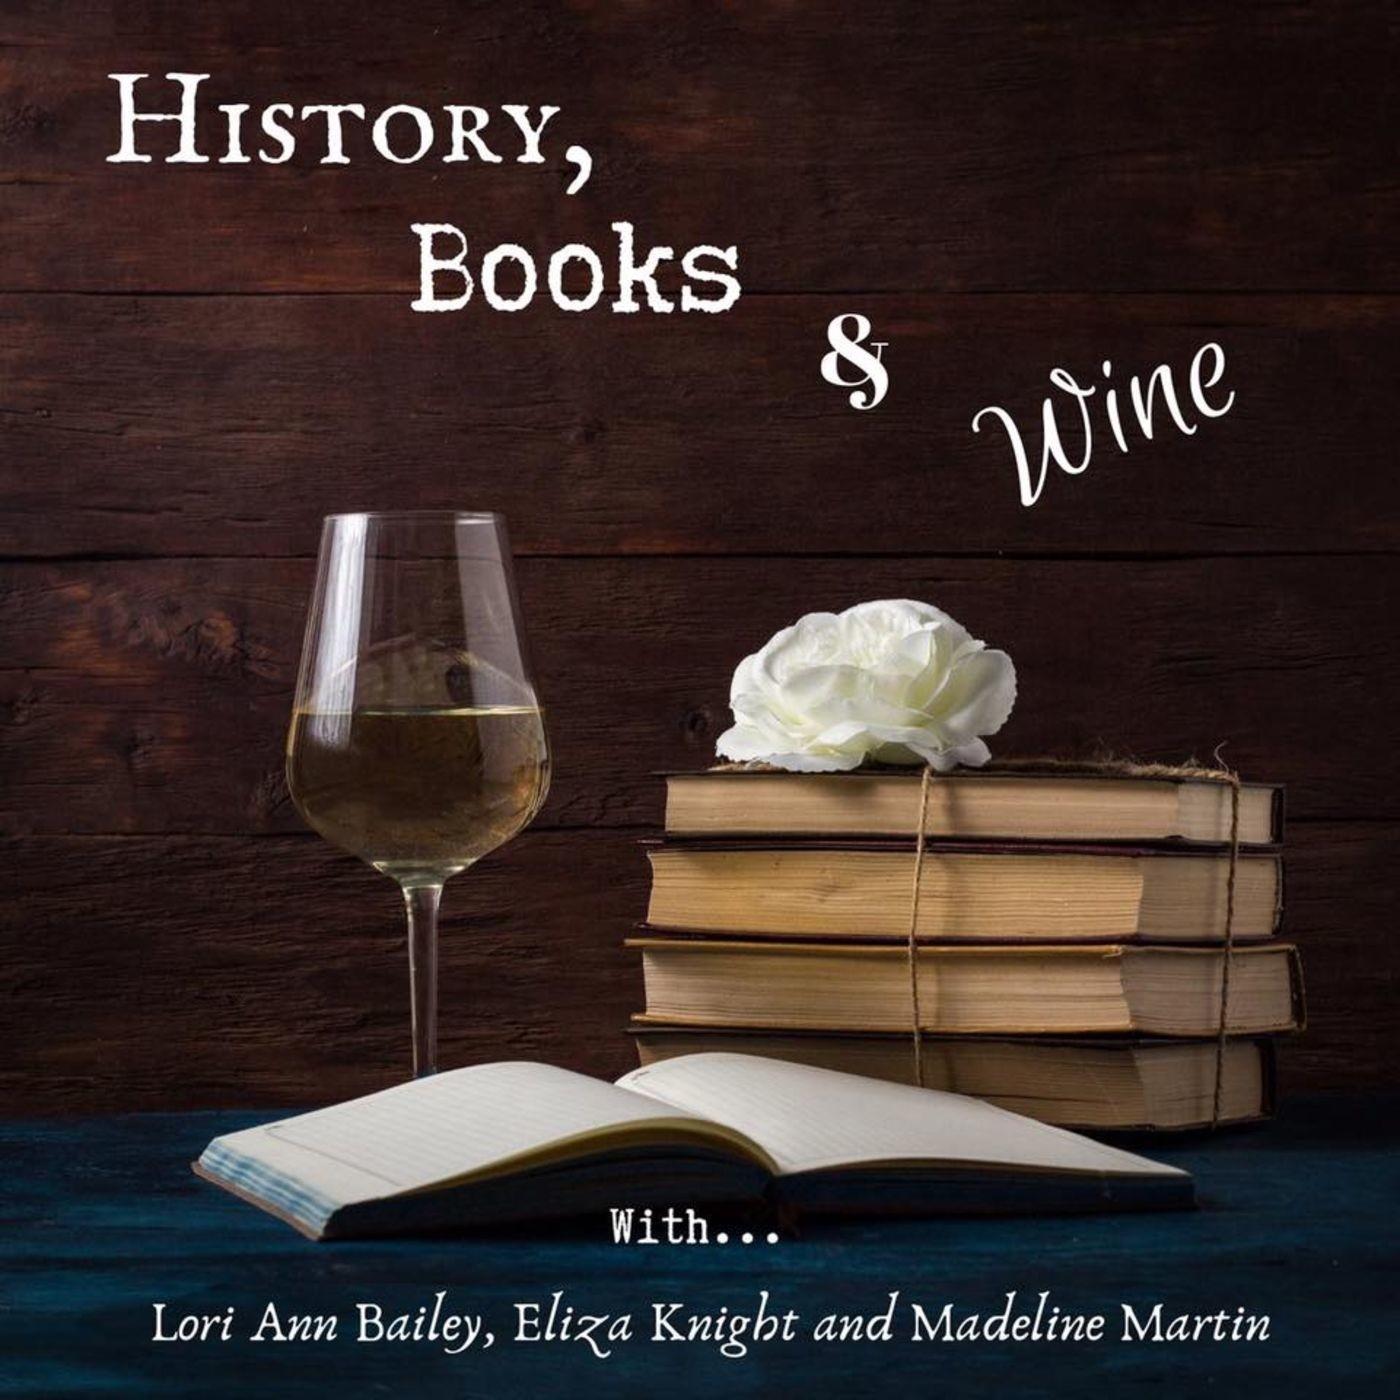 History, Books & Wine Podc